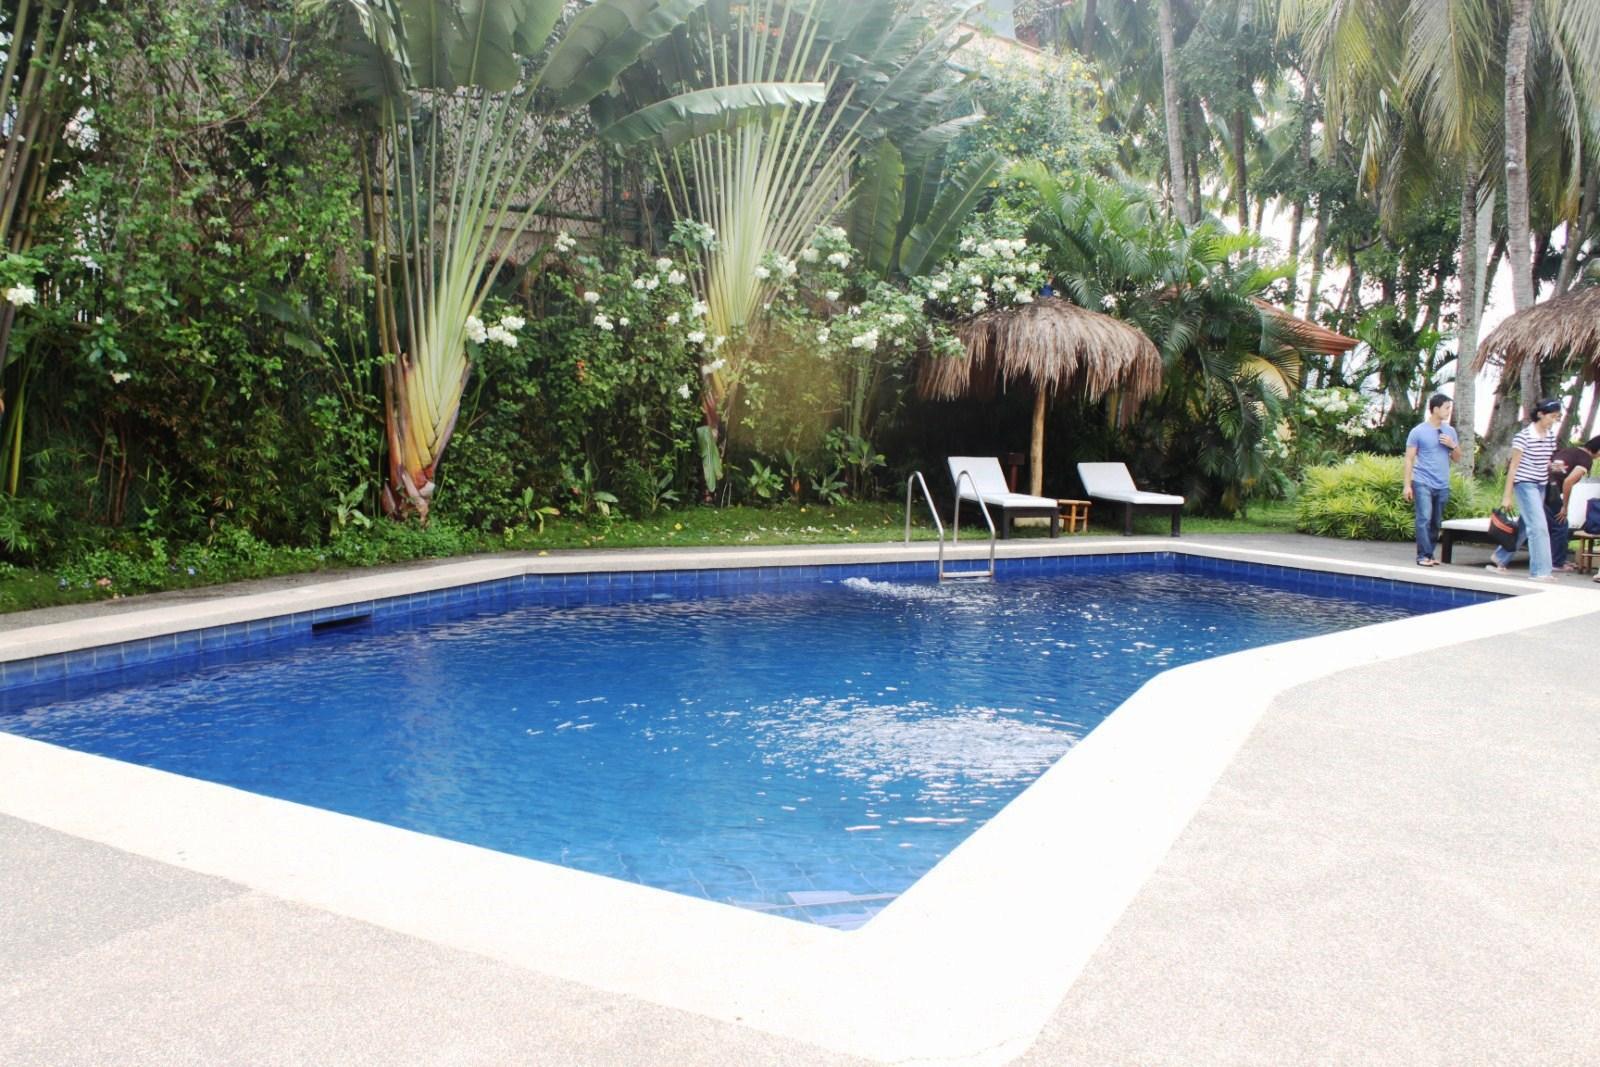 f y i fire your imagination resort feature pearl farm marina davao city davao del sur